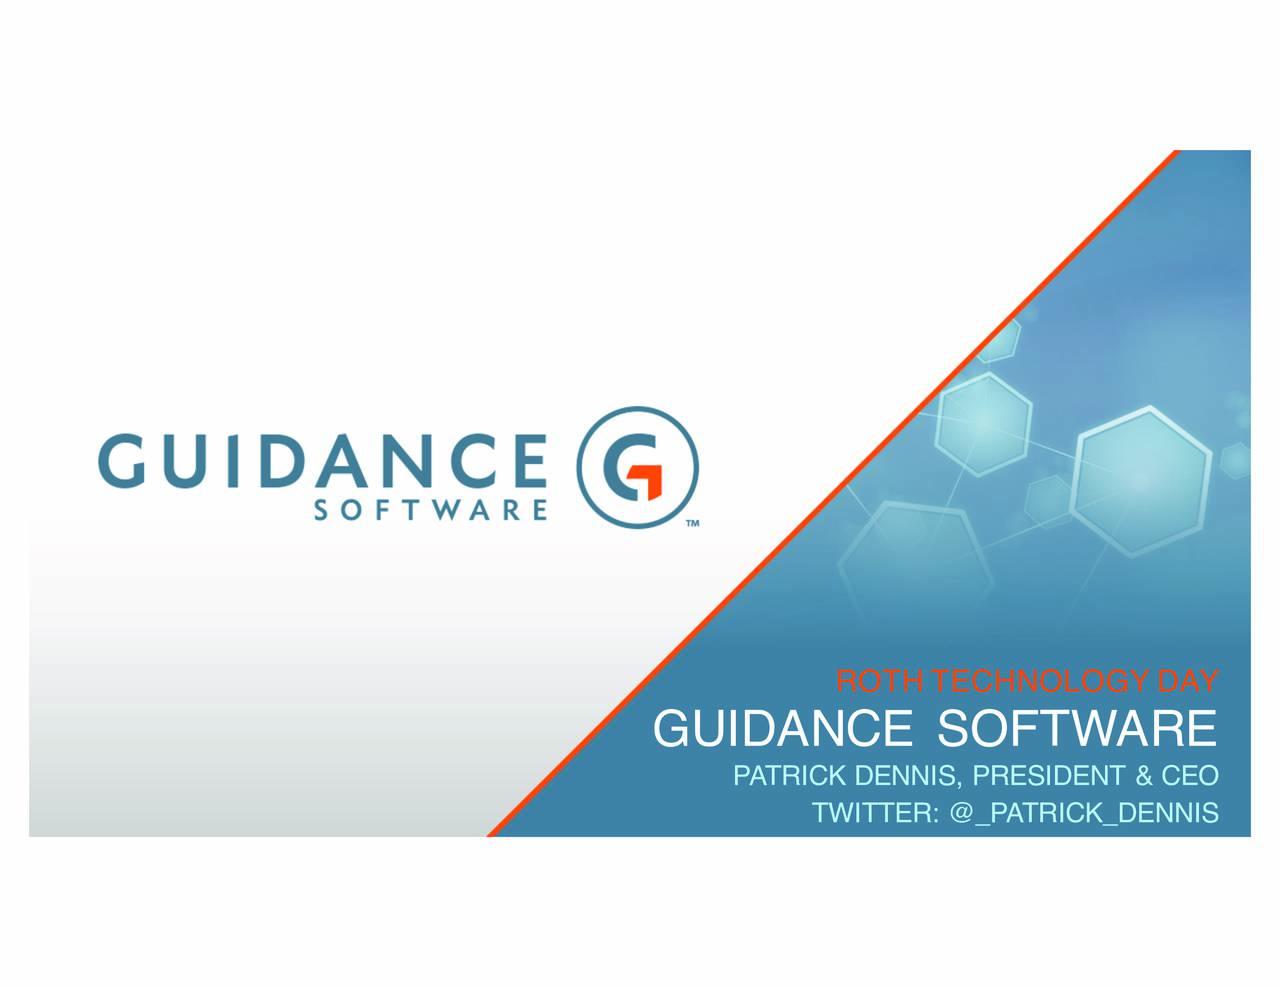 GUIDANCE SOFTWARE PATRICK DENNIS, PRESIDENT & CEO TWITTER: PATRICK_DENNIS